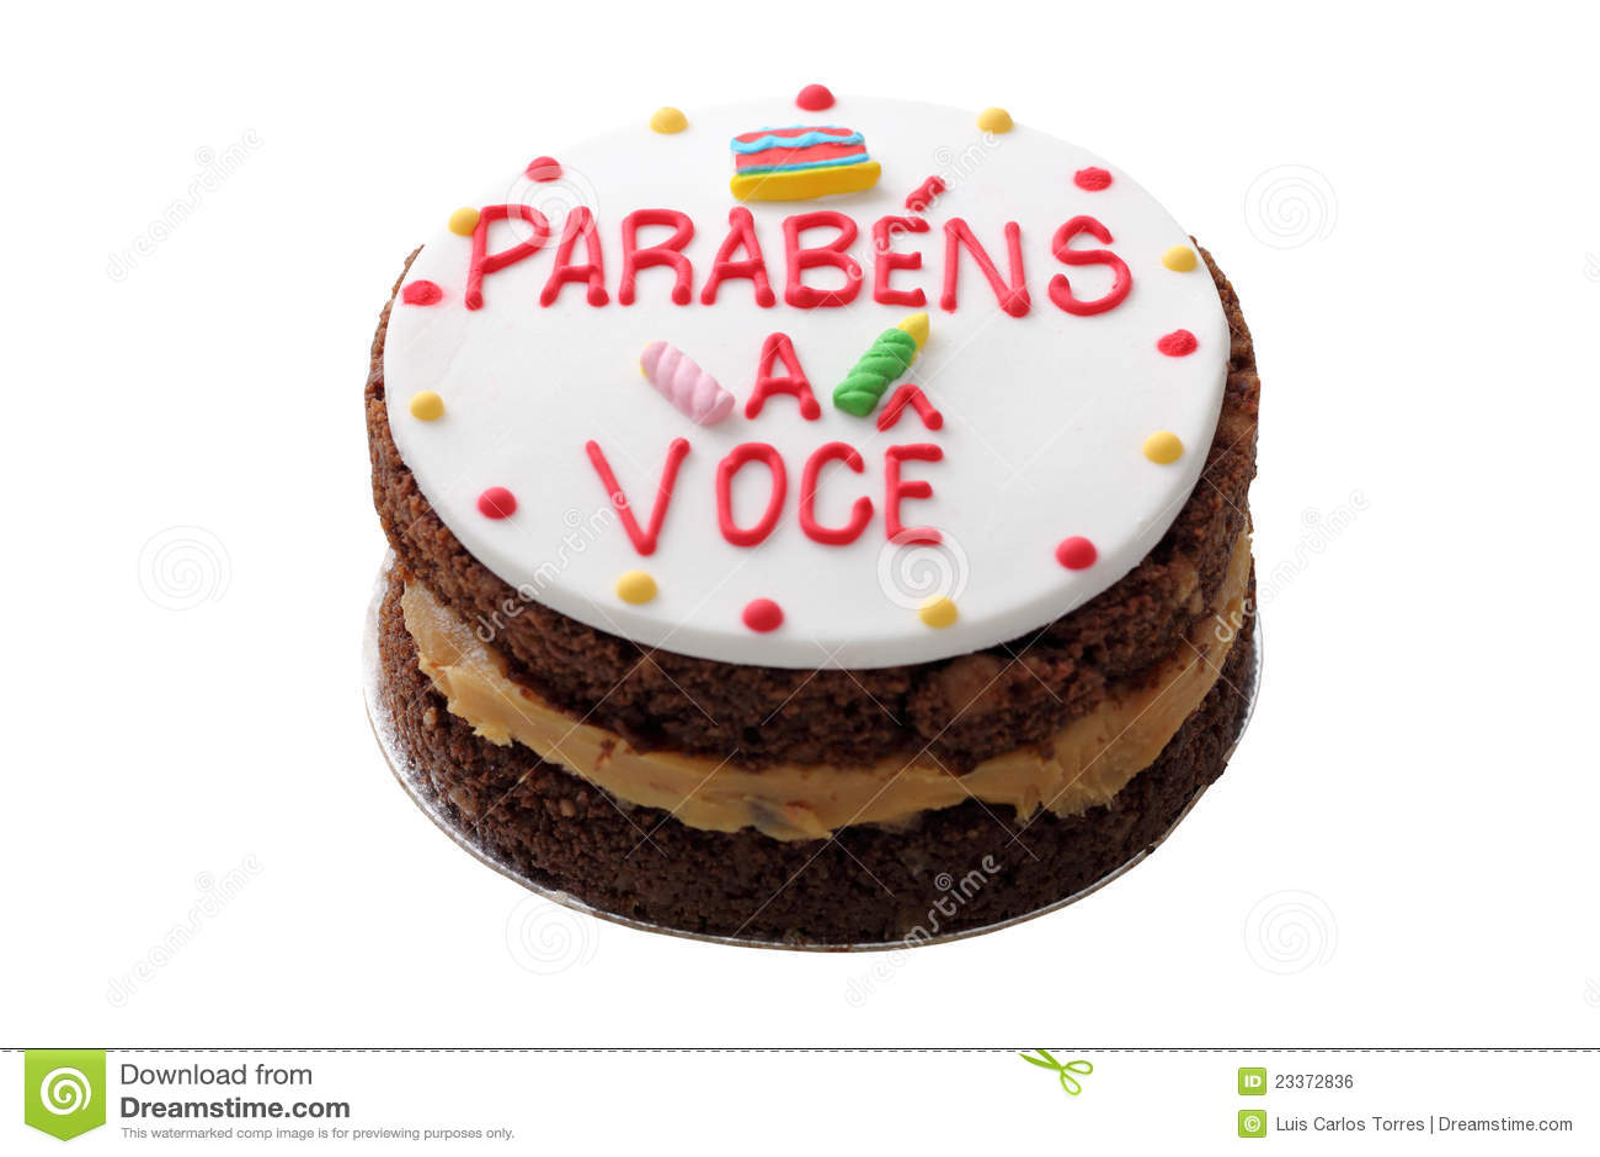 Phenomenal Brazilian Birthday Cake Stock Photo Image Of Isolated 23372836 Funny Birthday Cards Online Inifodamsfinfo